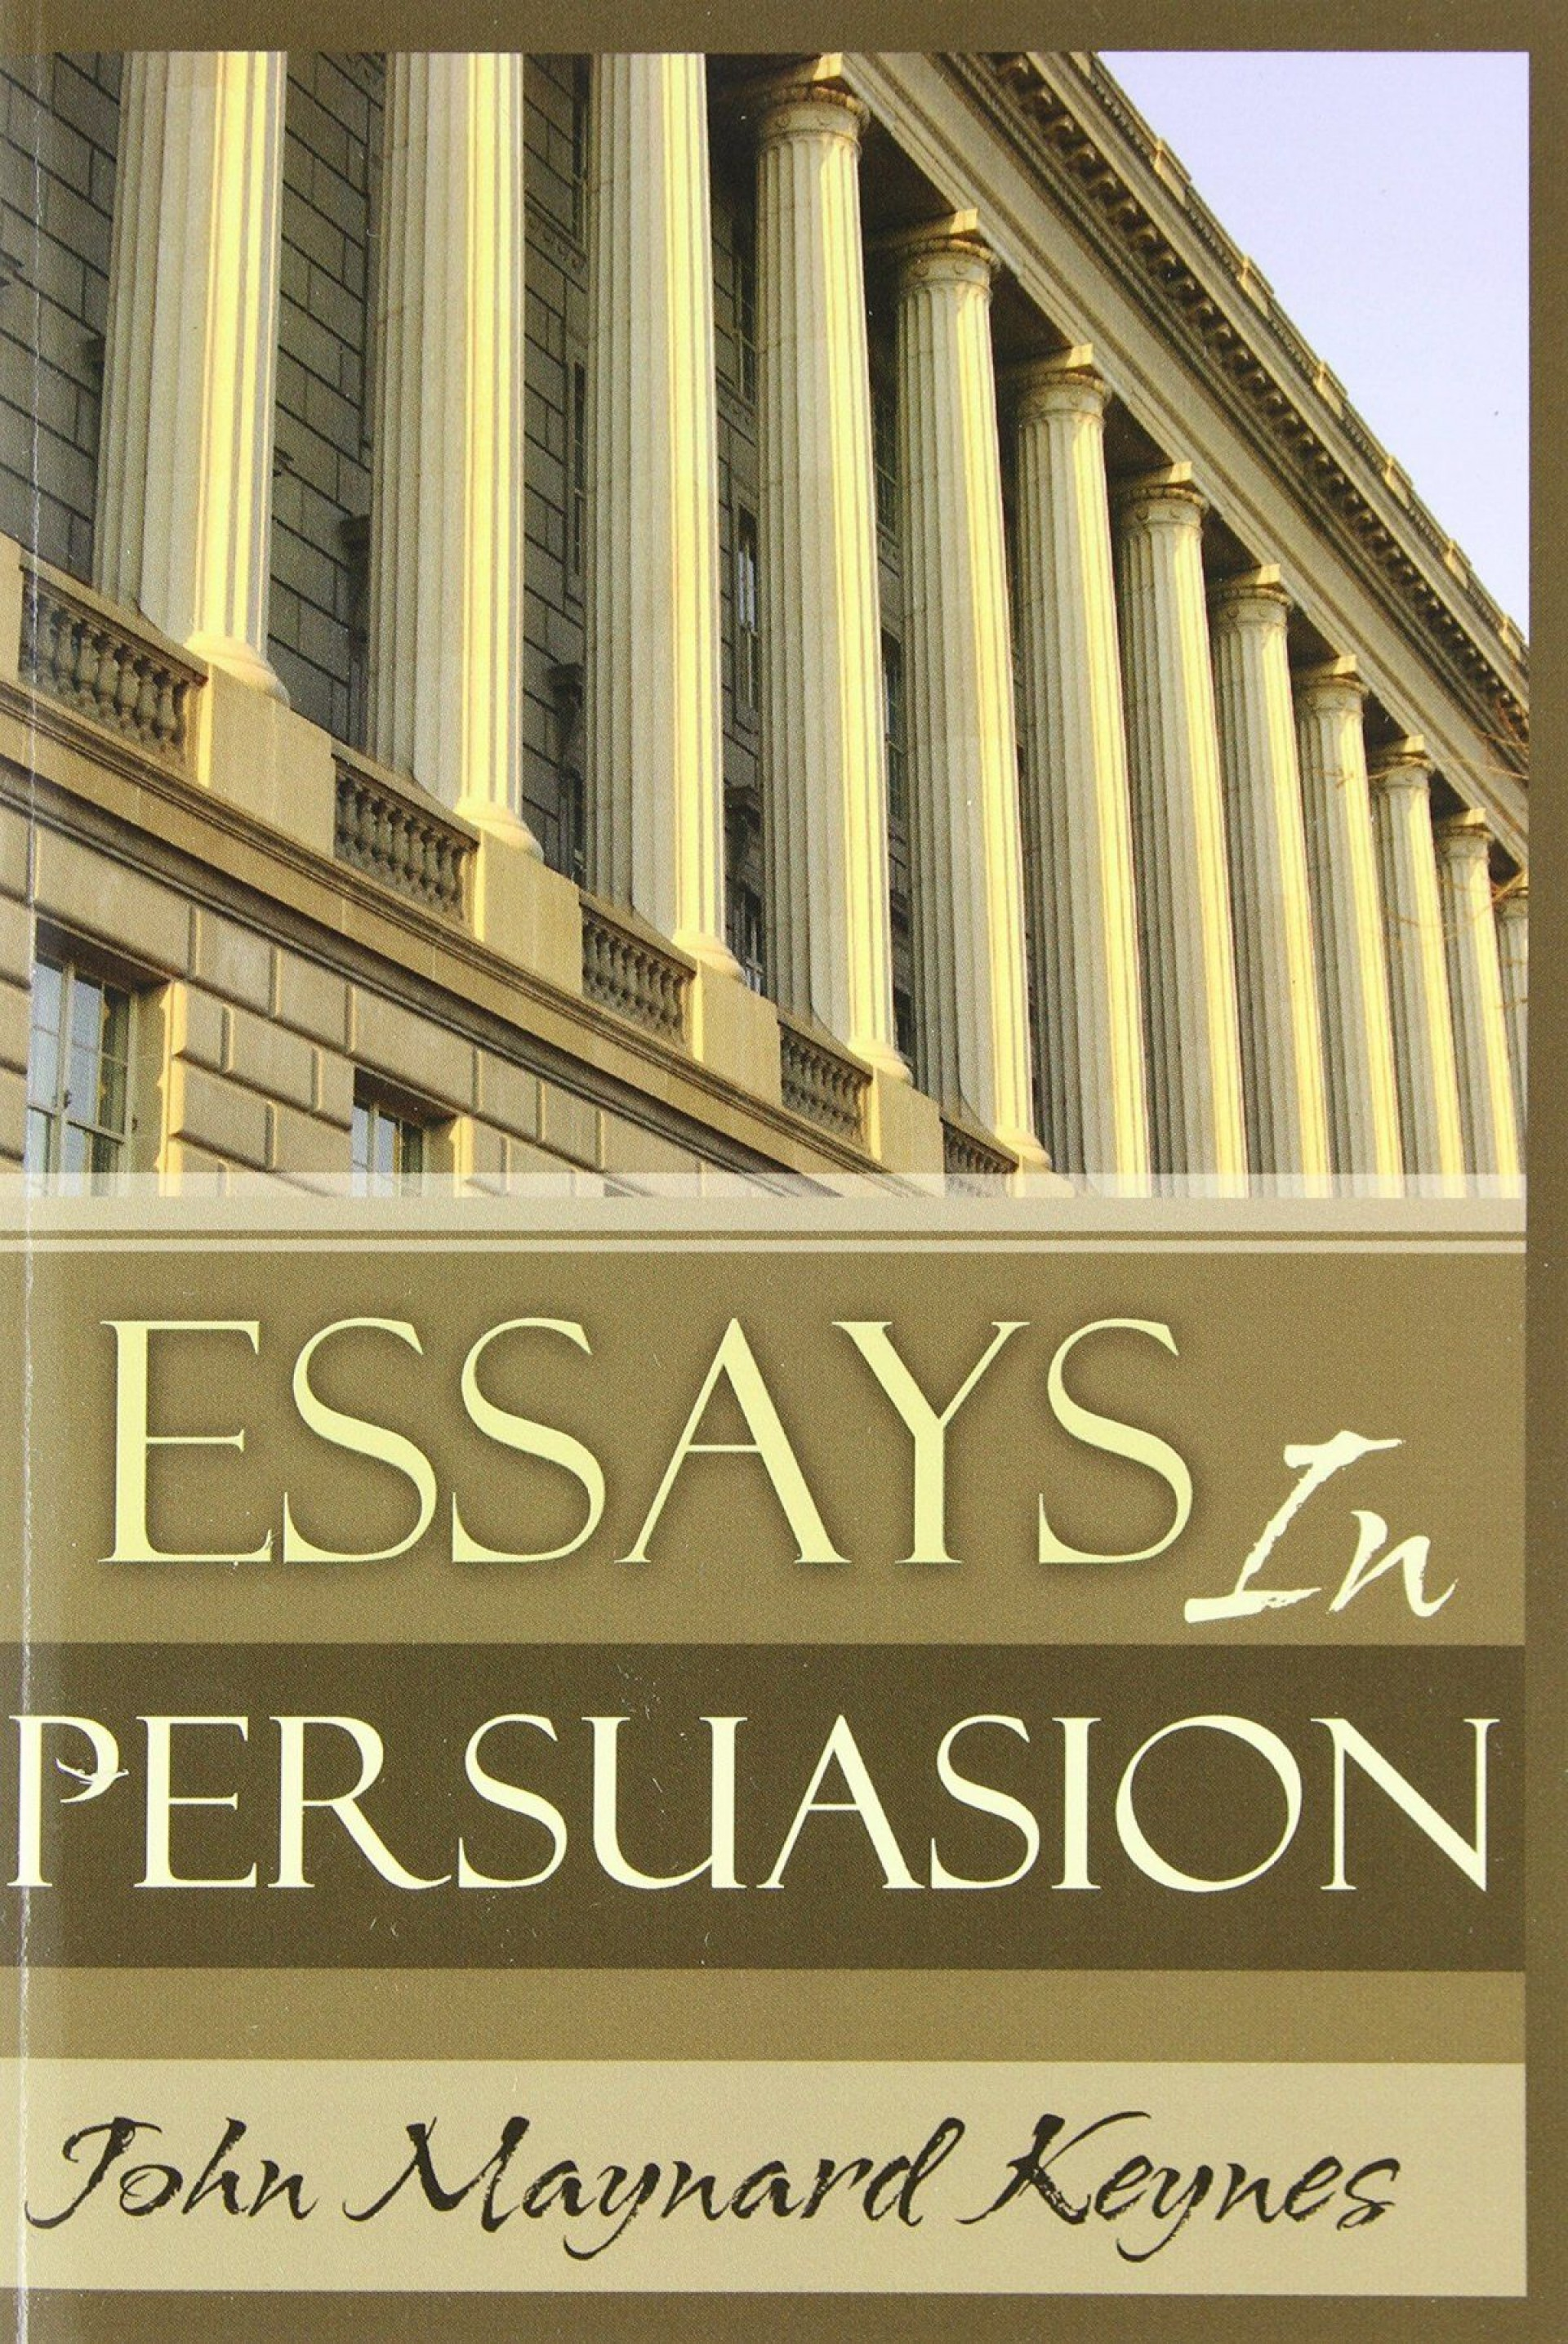 003 Essays In Persuasion Essay Remarkable Audiobook Pdf John Maynard Keynes Summary 1920